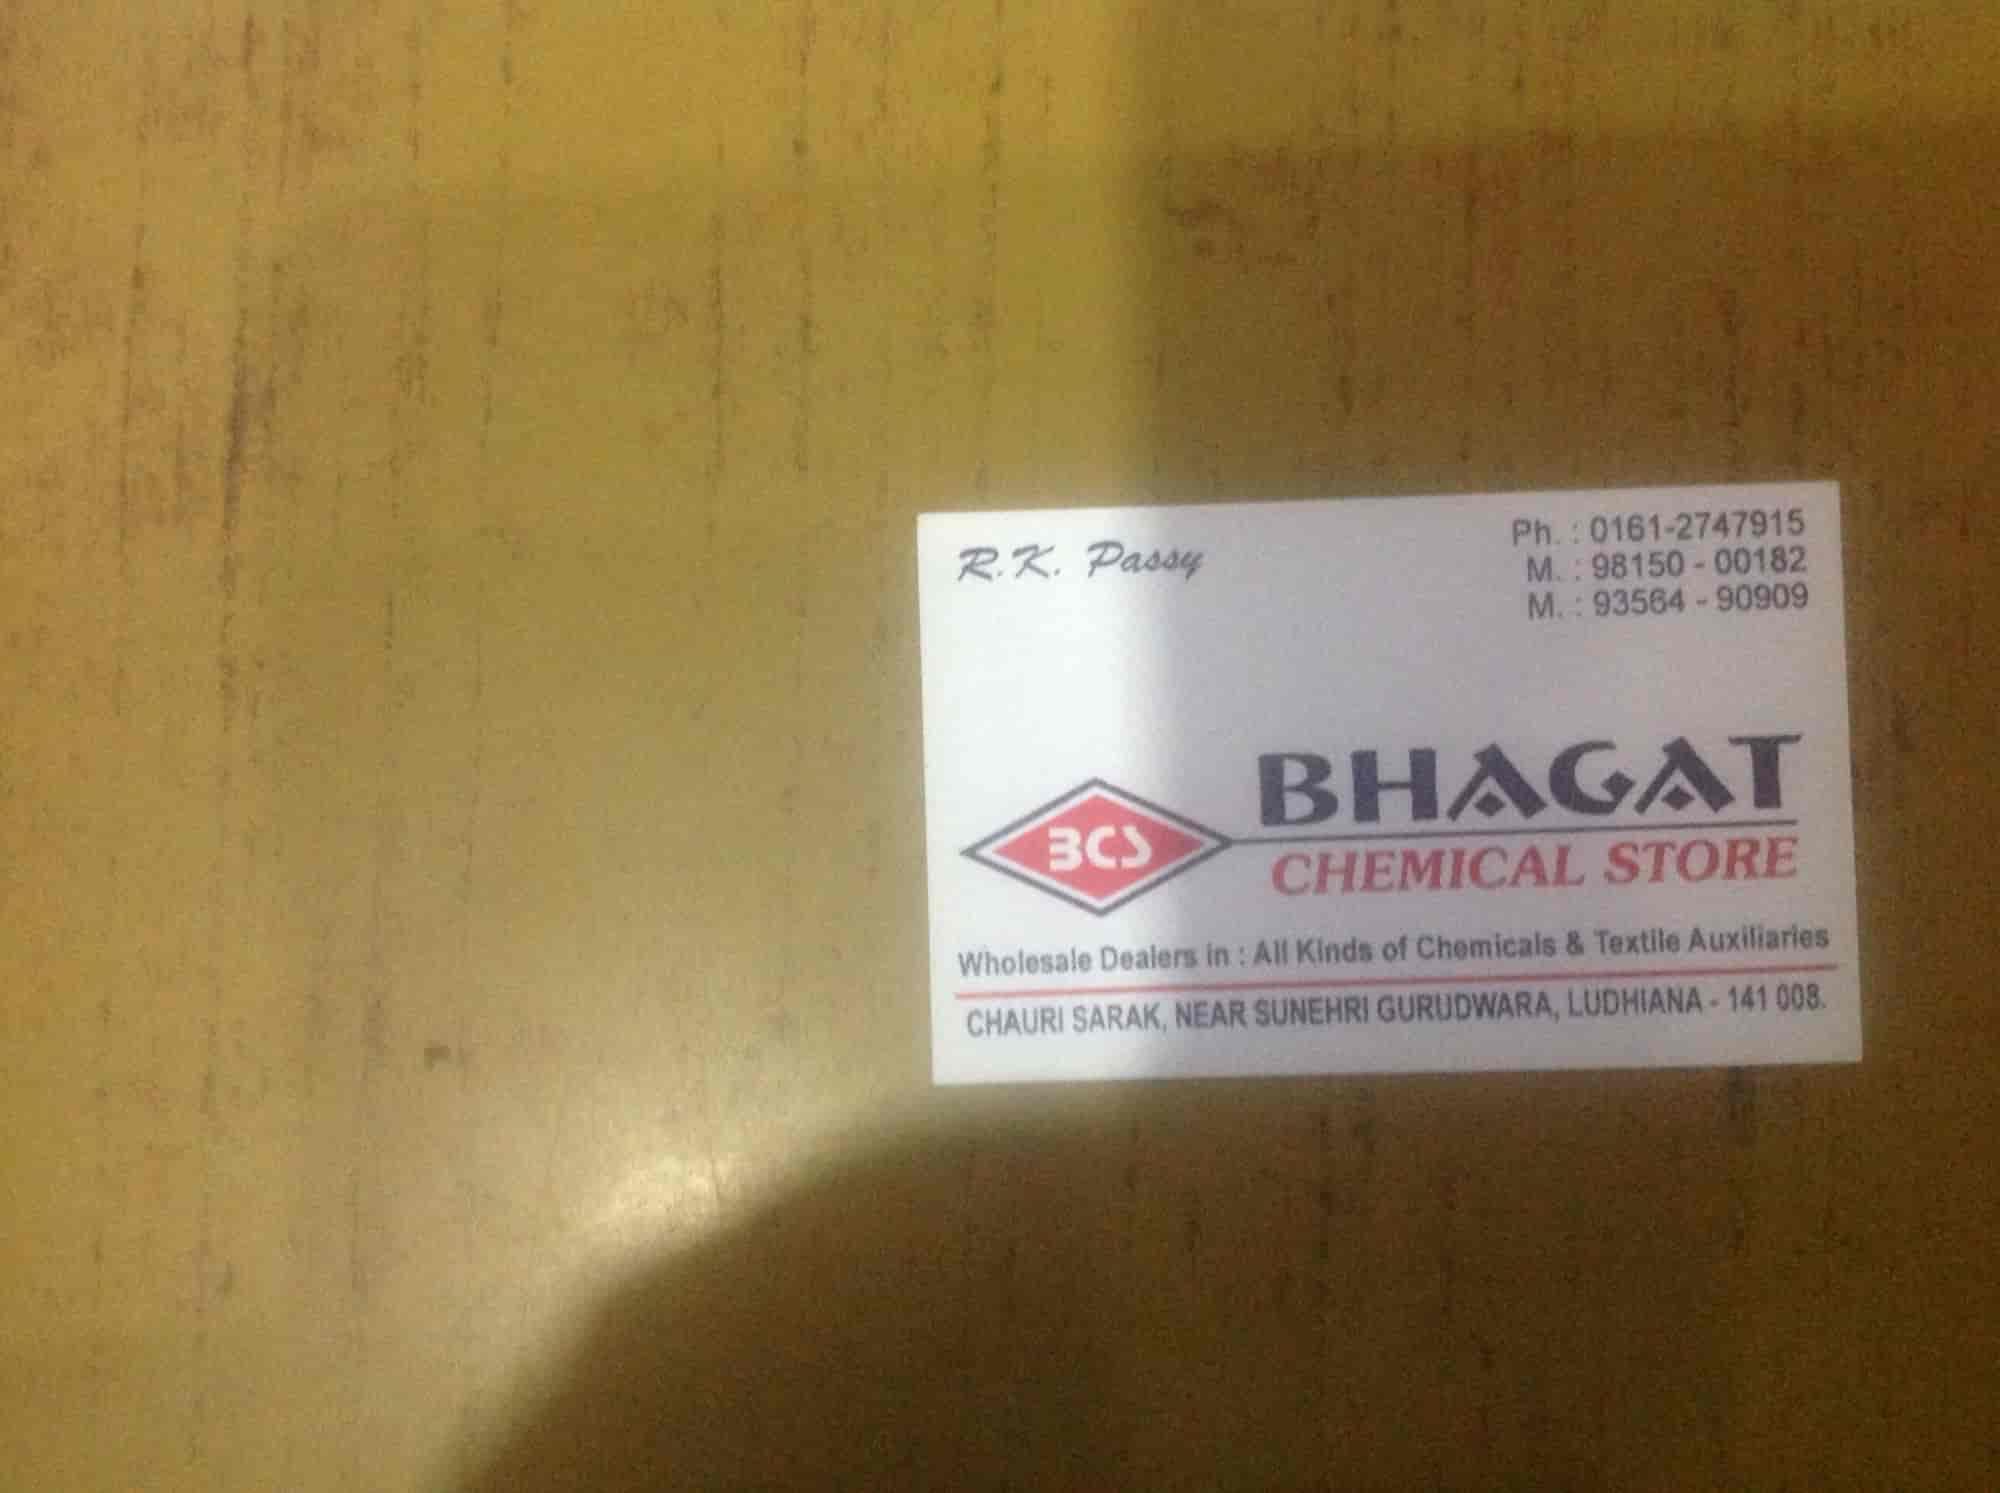 Bhagat Chemicals Store, Chauri Sarak - Industrial Chemical